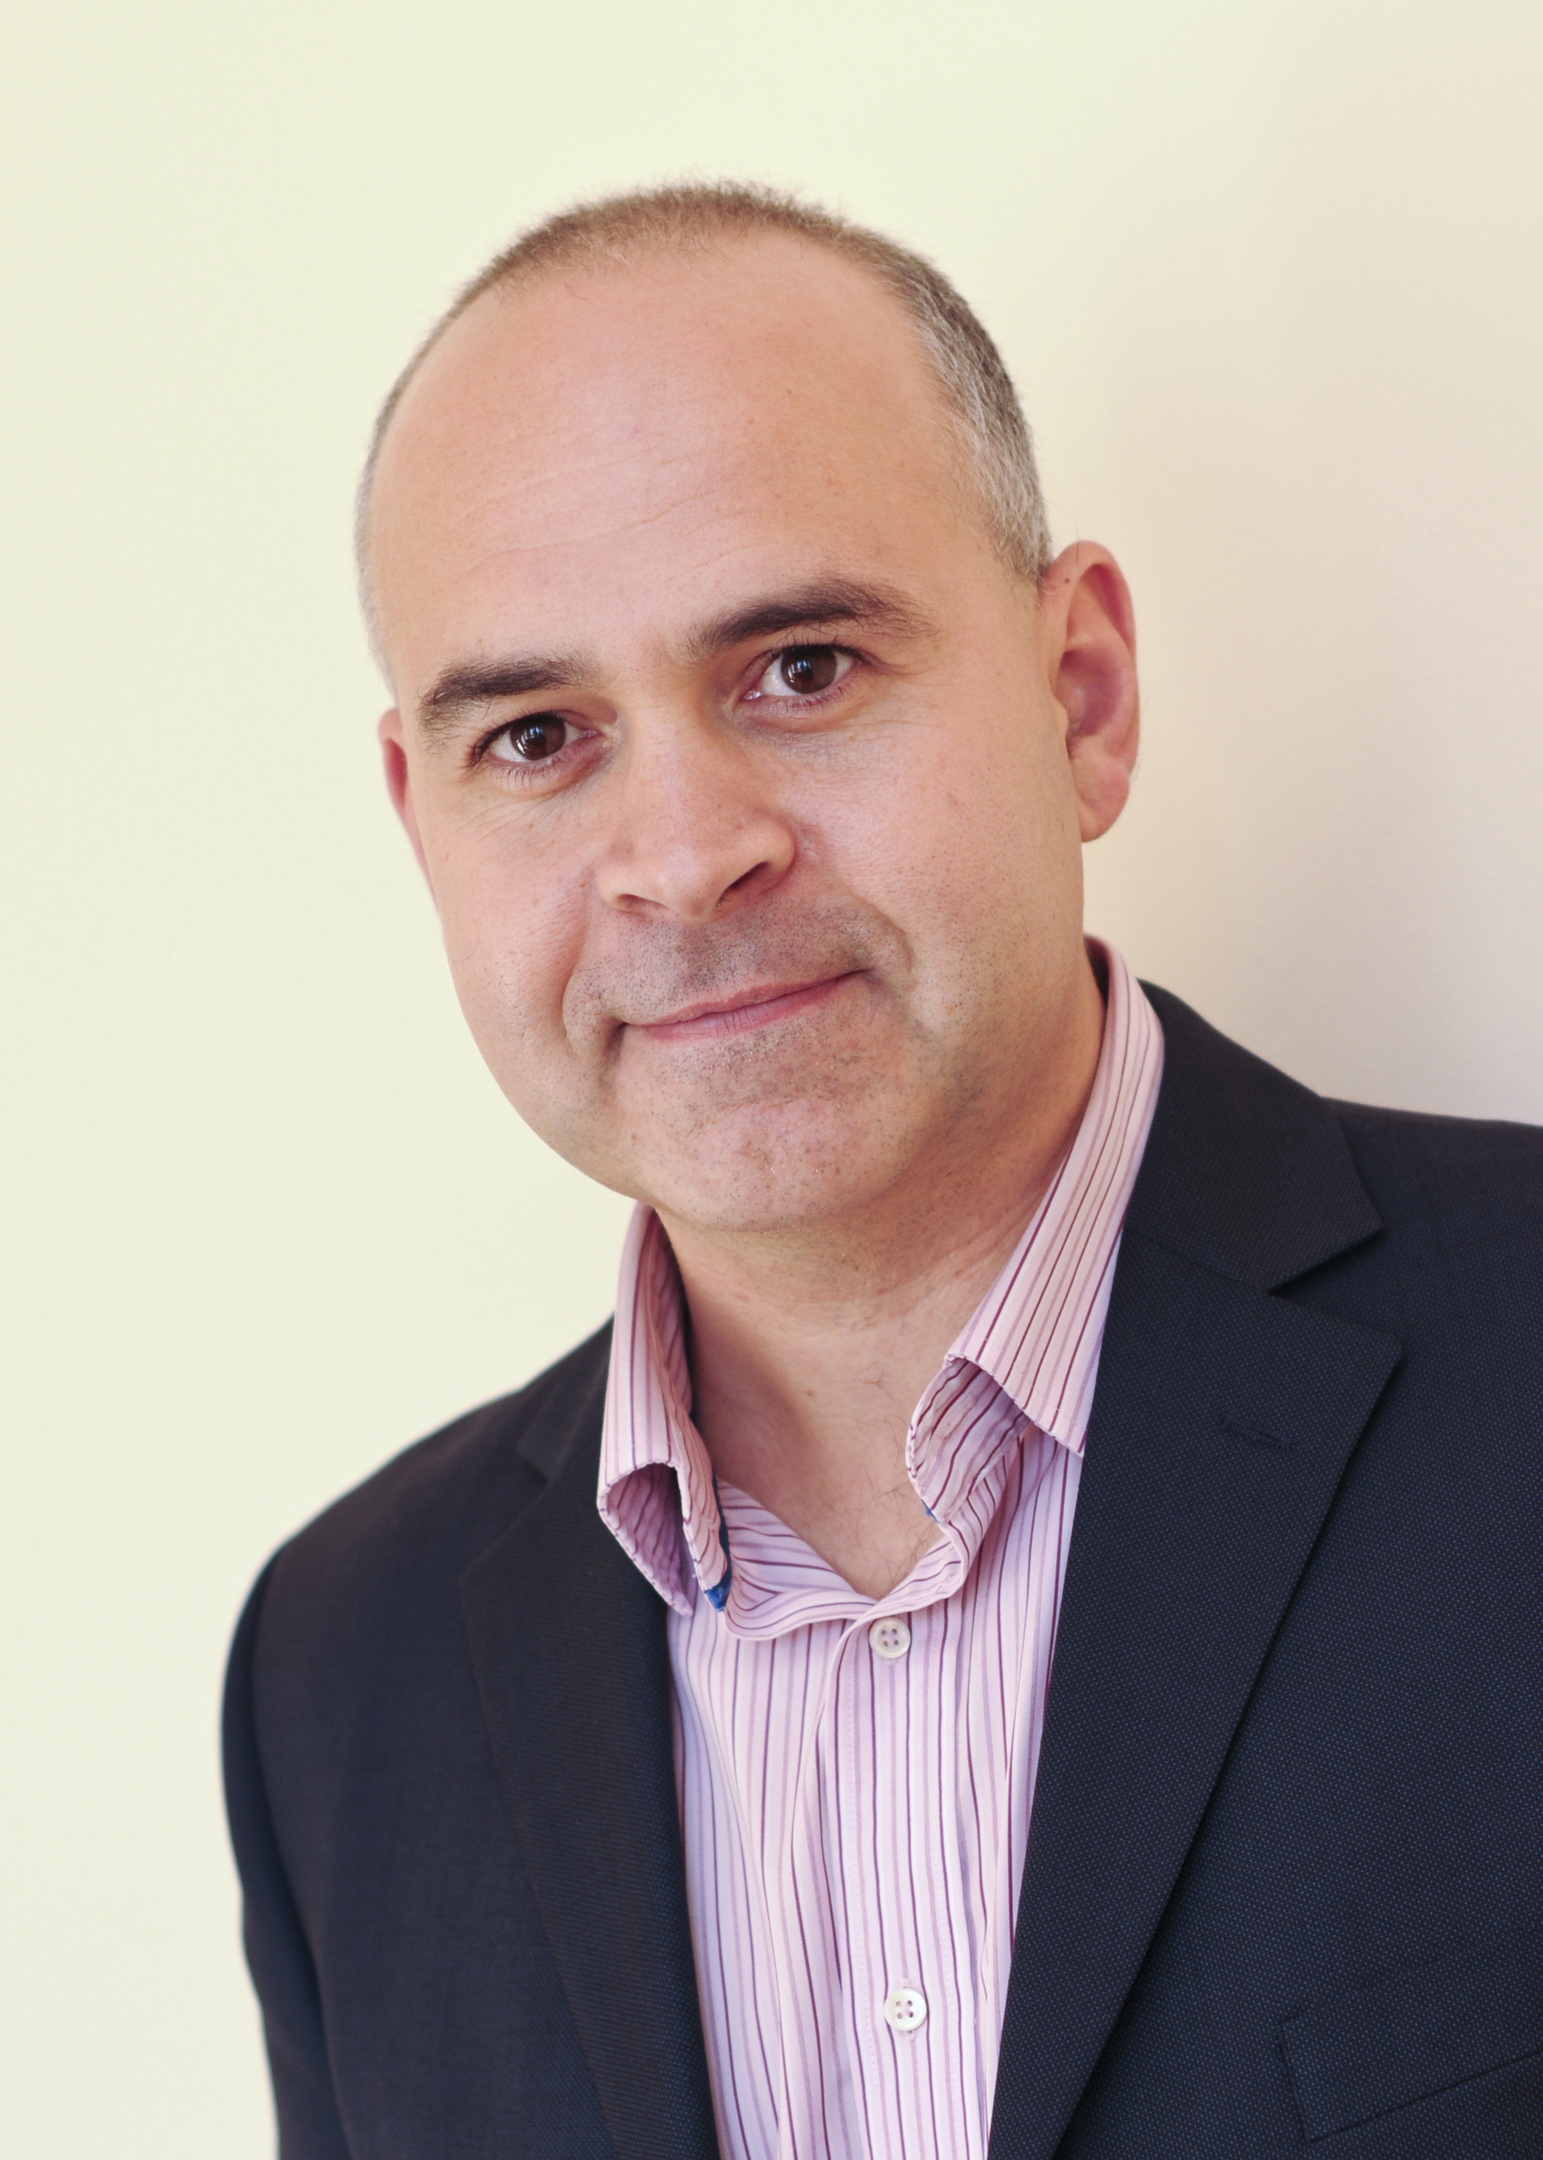 Professor Ewan Gillon